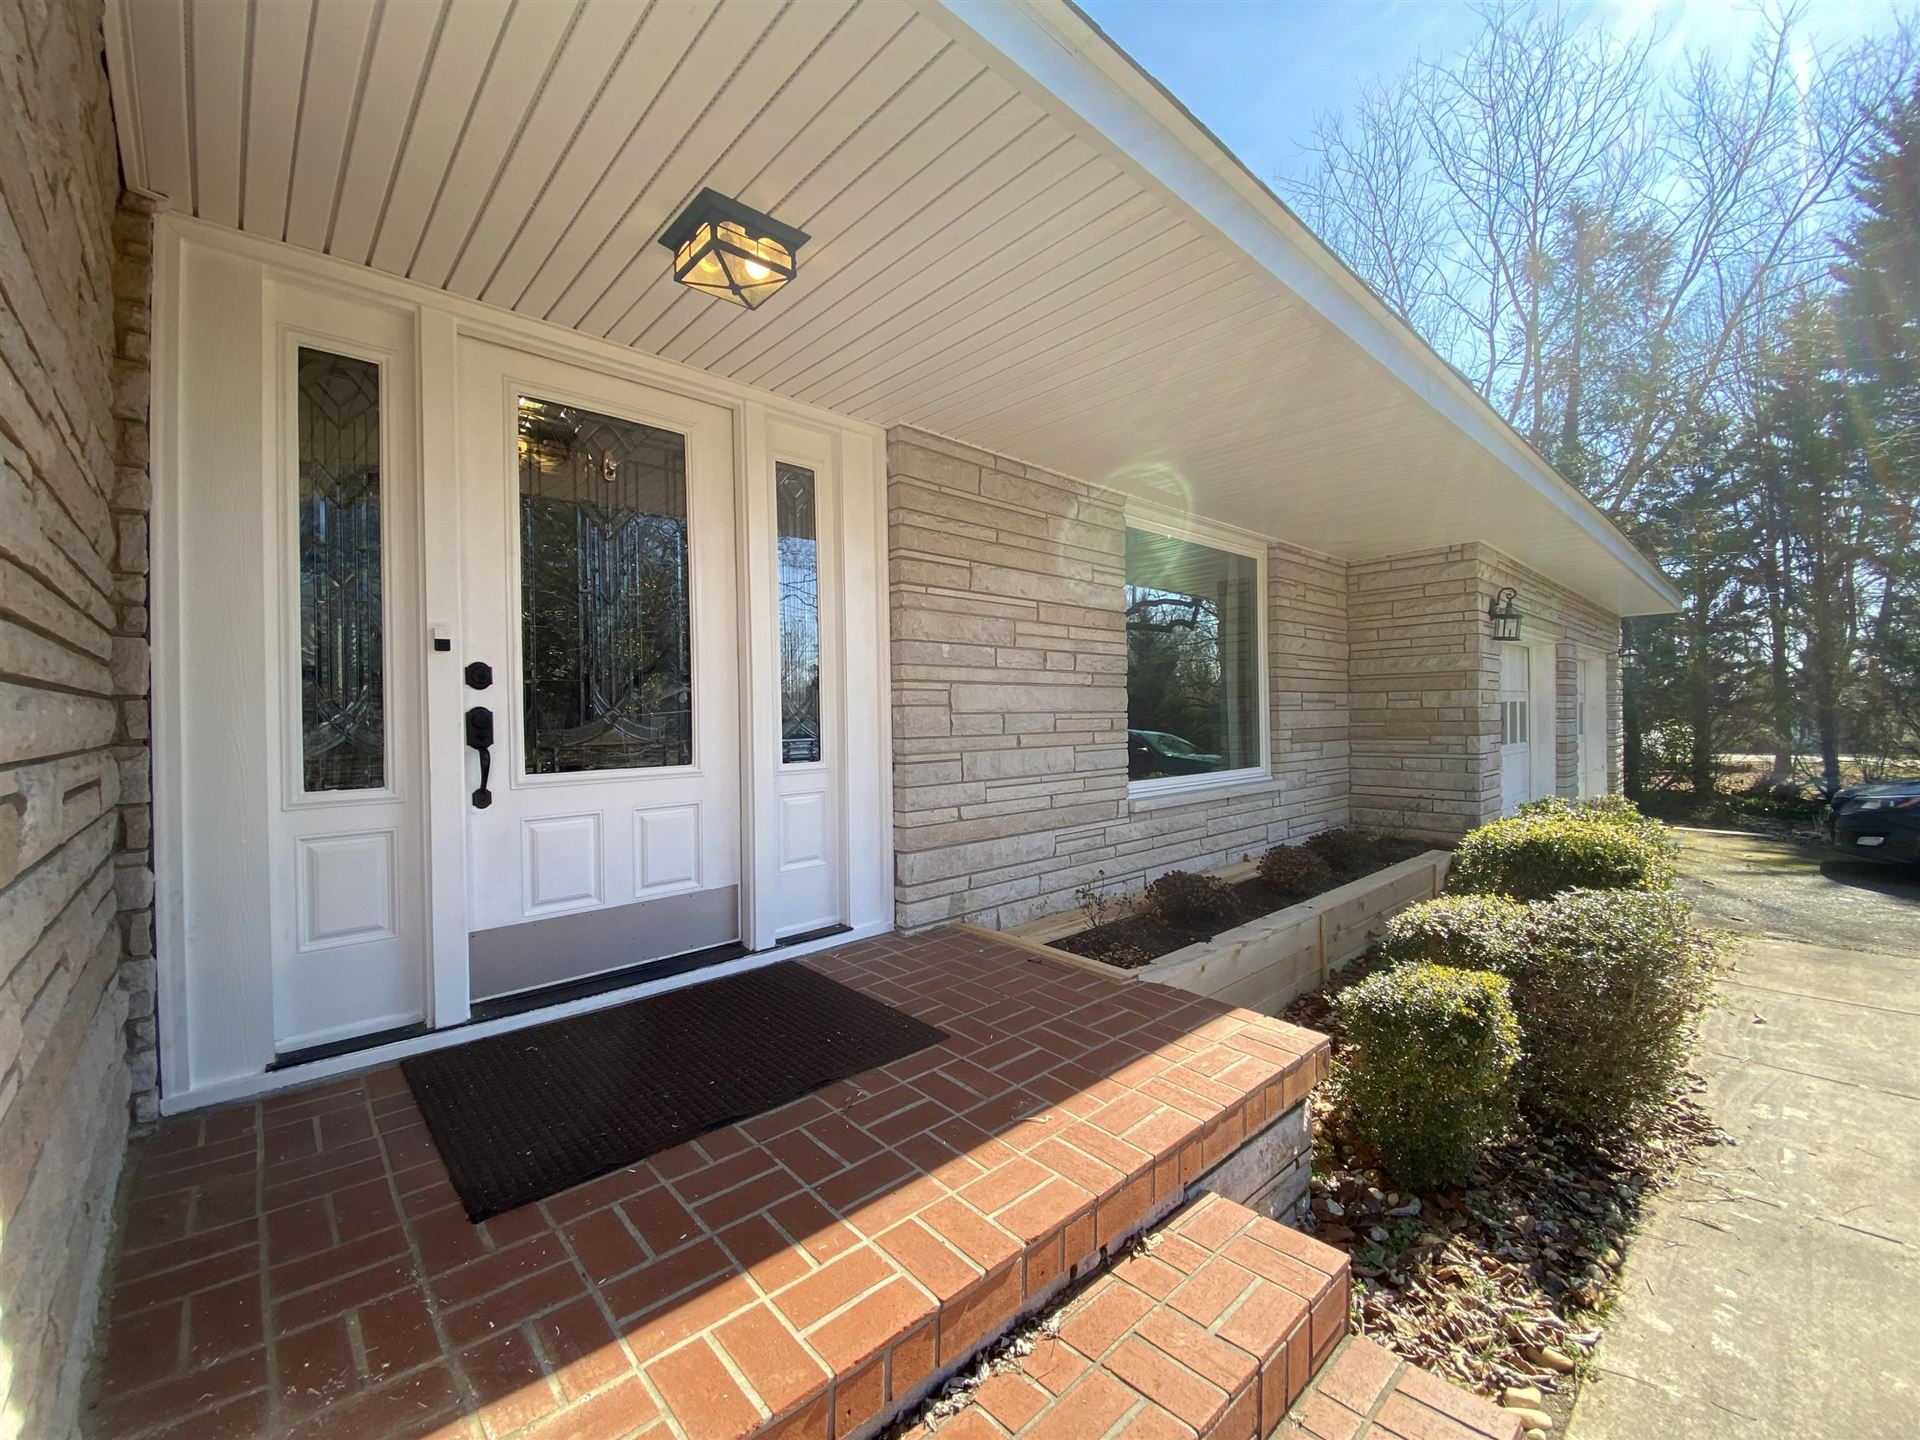 Photo of 103 Orchard Circle, Oak Ridge, TN 37830 (MLS # 1143540)